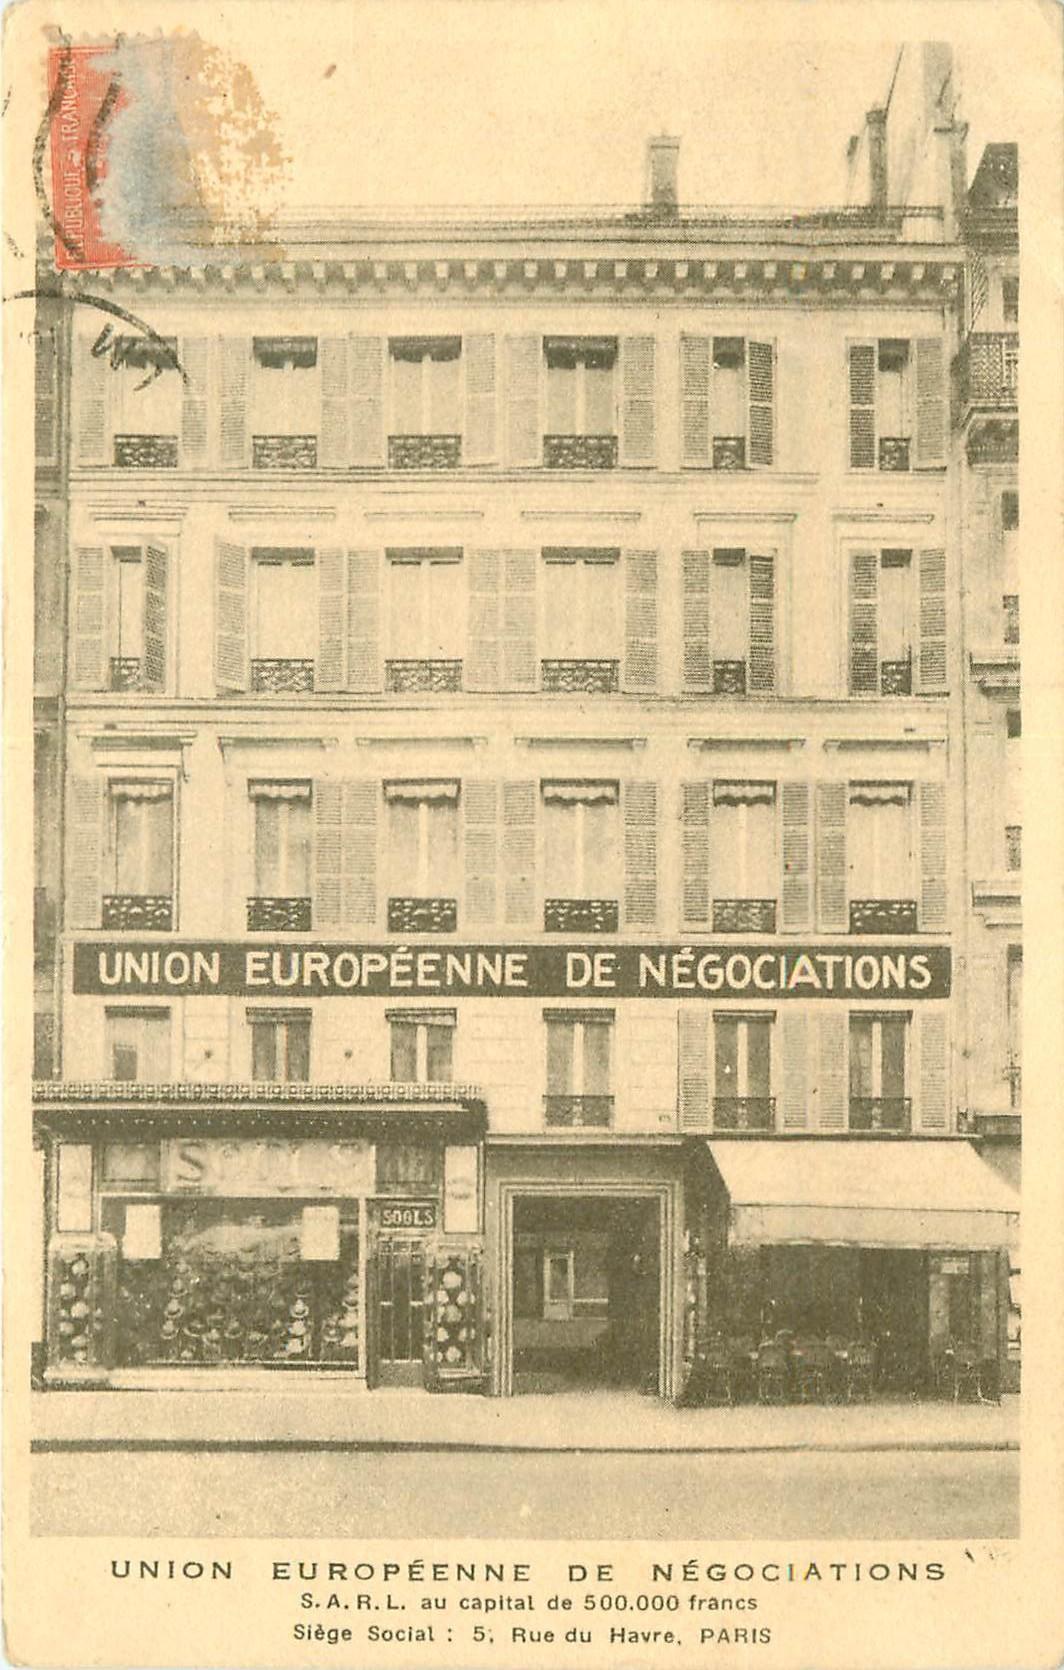 WW PARIS VIII. Union Européenne de Négociations 5 rue du Havre